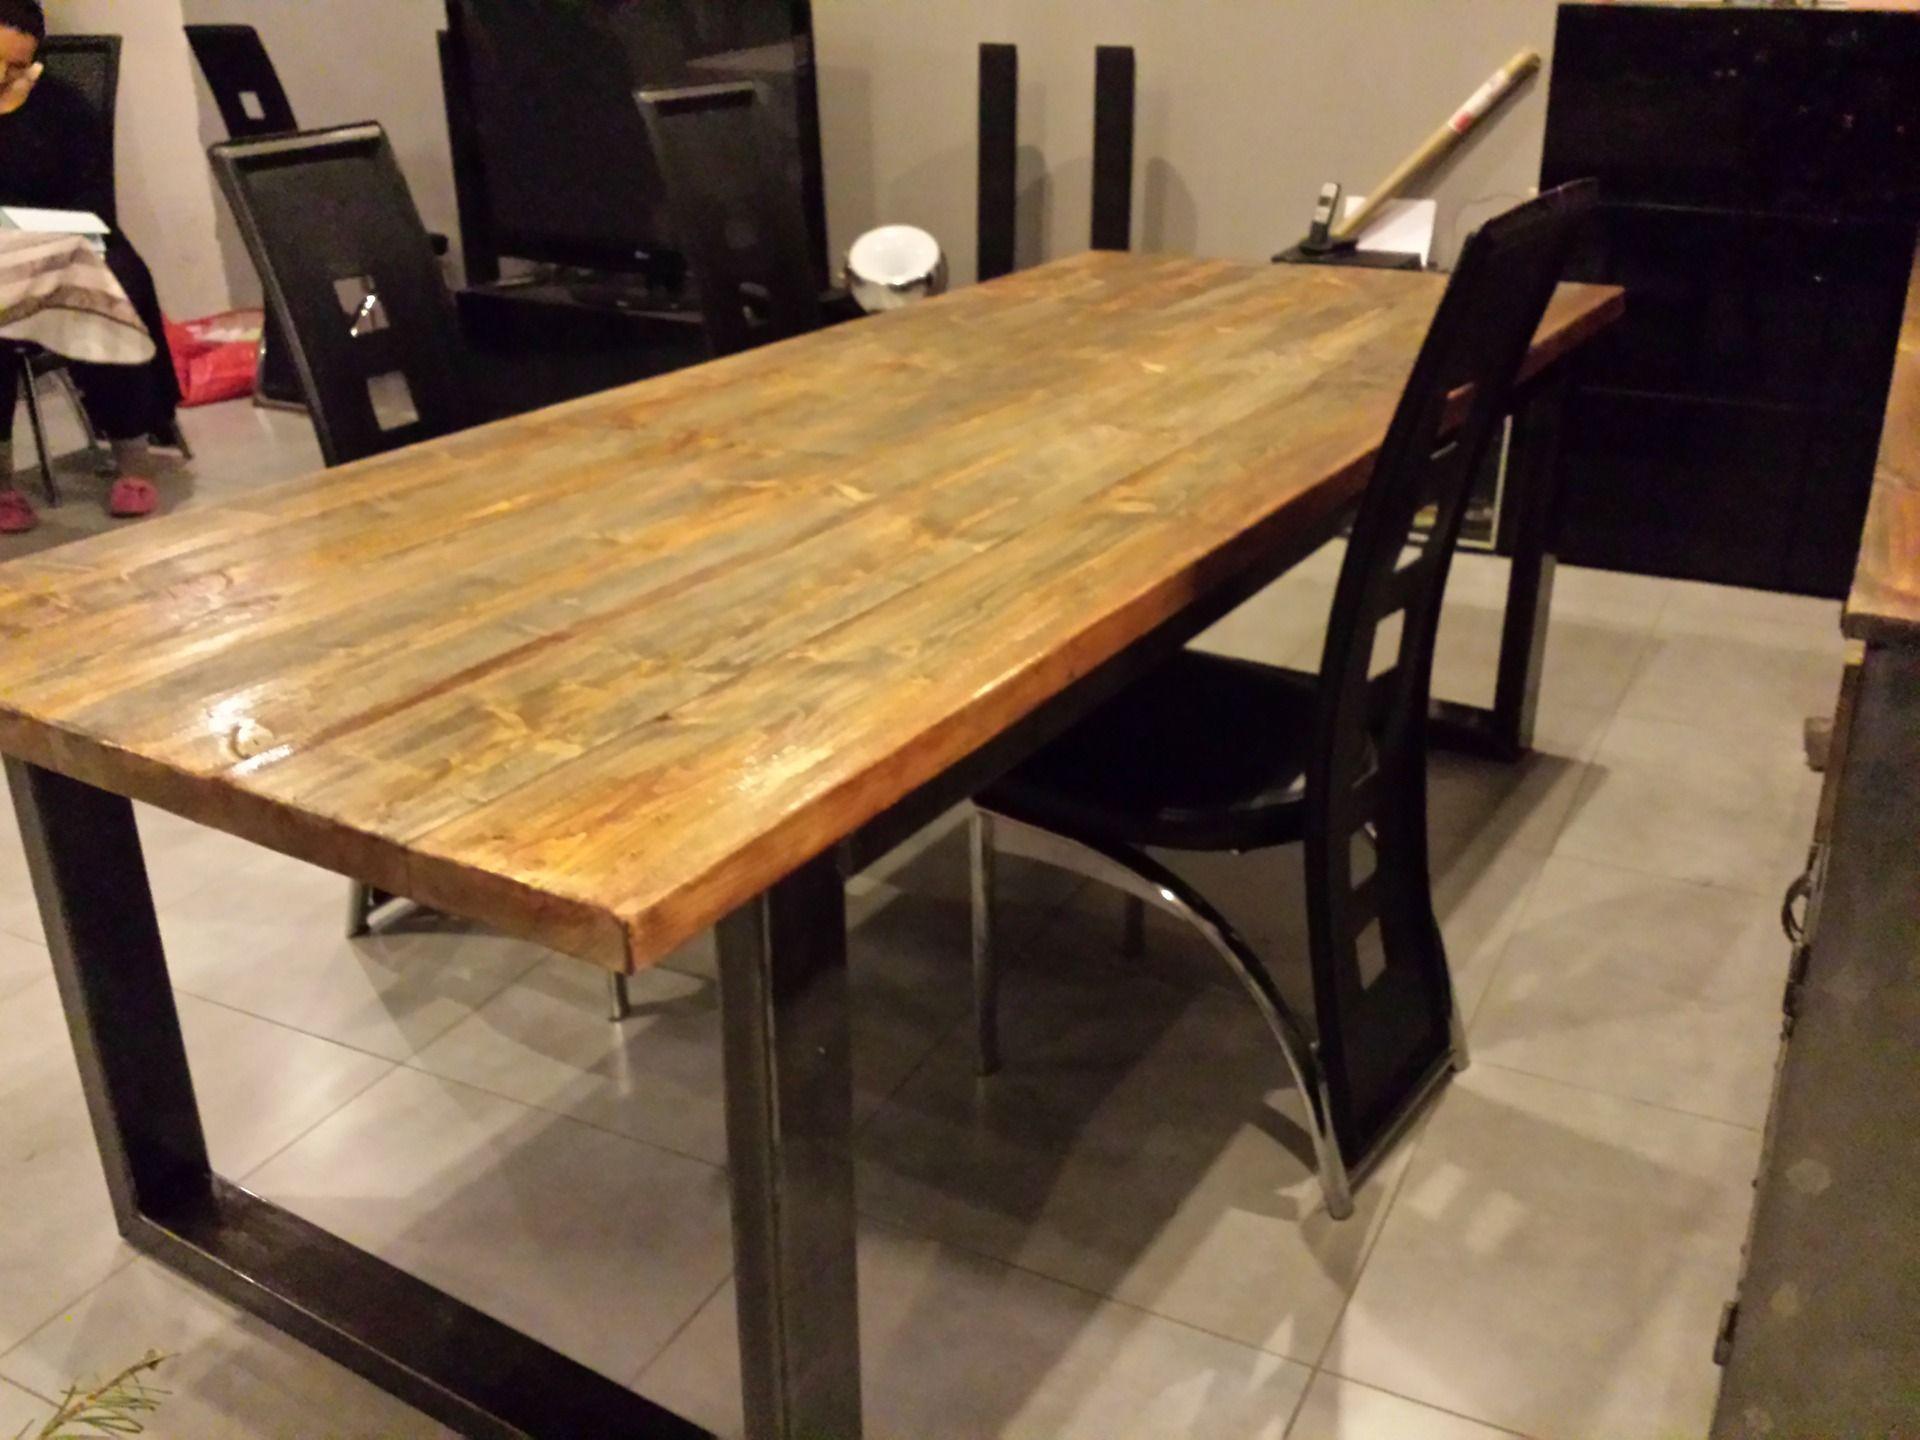 meuble industriel table de salle manger pied en acier. Black Bedroom Furniture Sets. Home Design Ideas